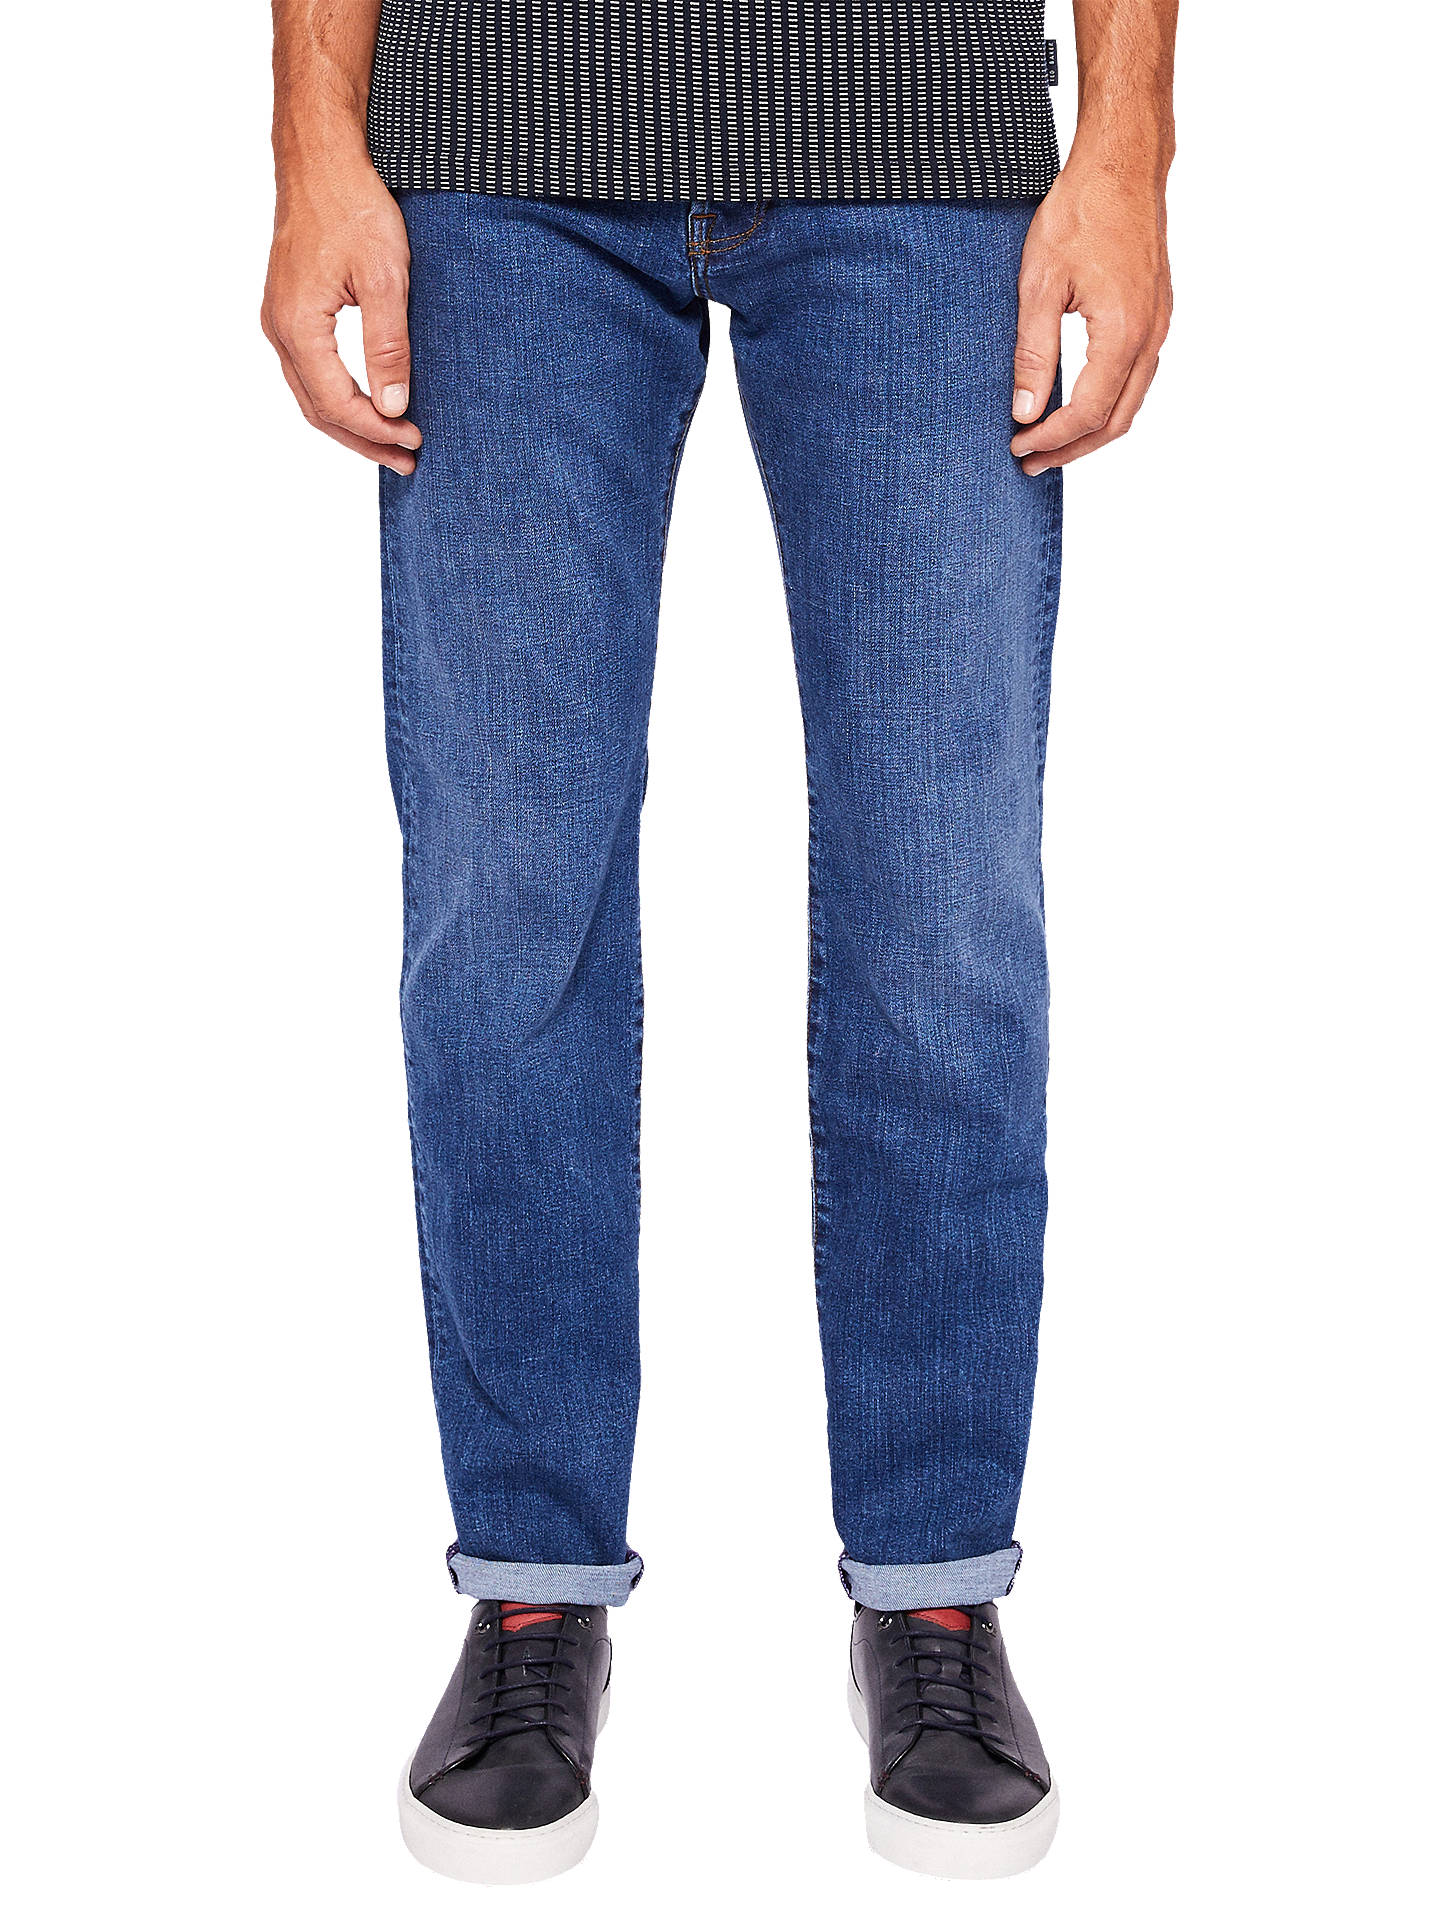 310b00d7c04121 Buy Ted Baker Newbie Jeans